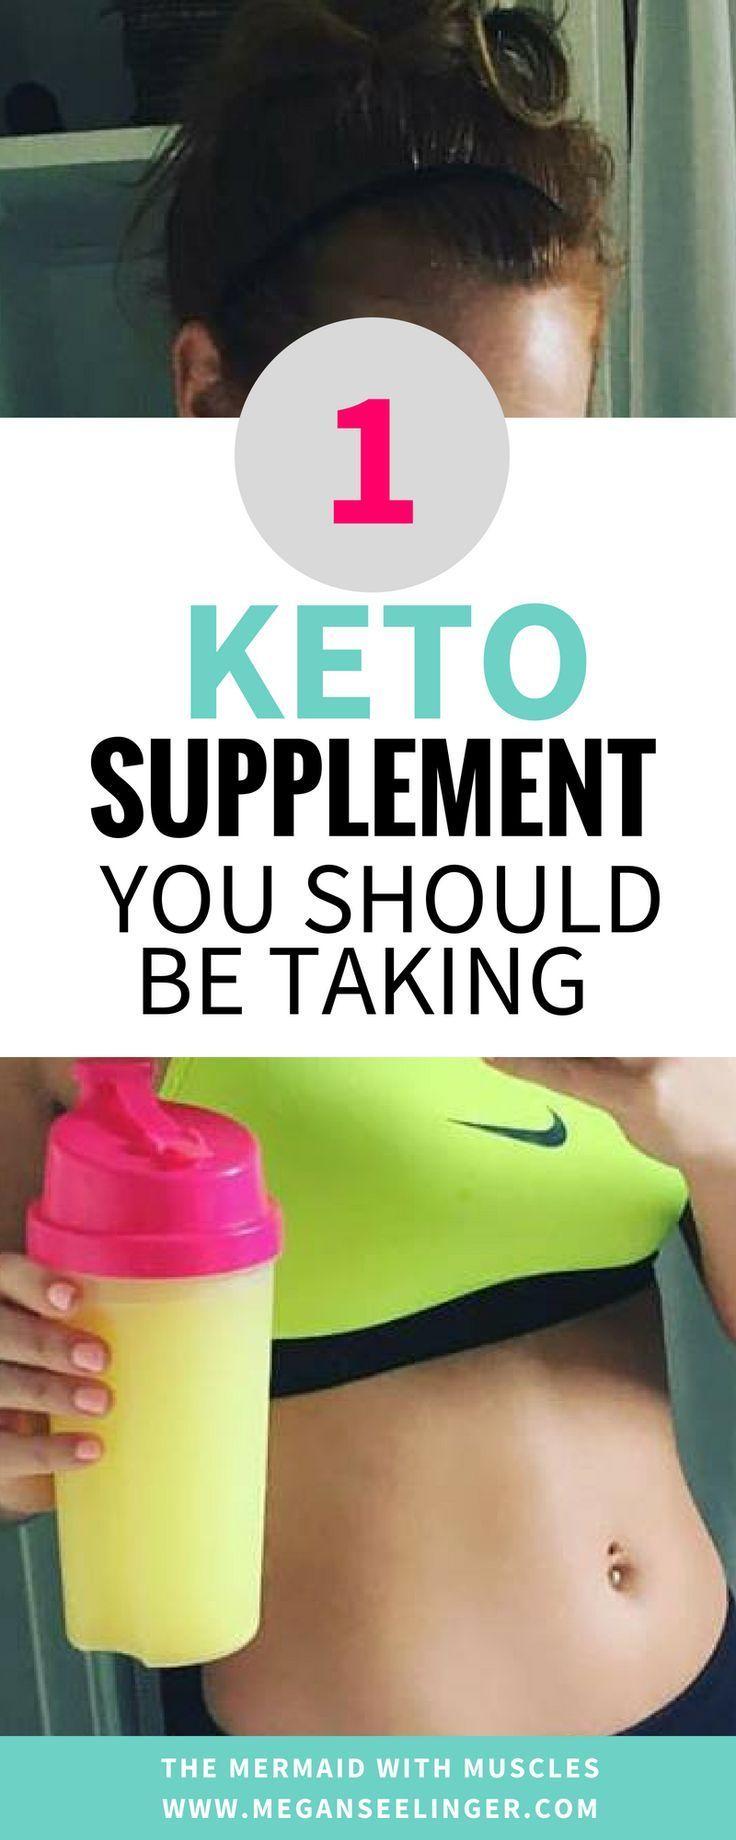 5 Benefits of Exogenous Ketones + Perfect Keto | Keto Diet Suplement 11